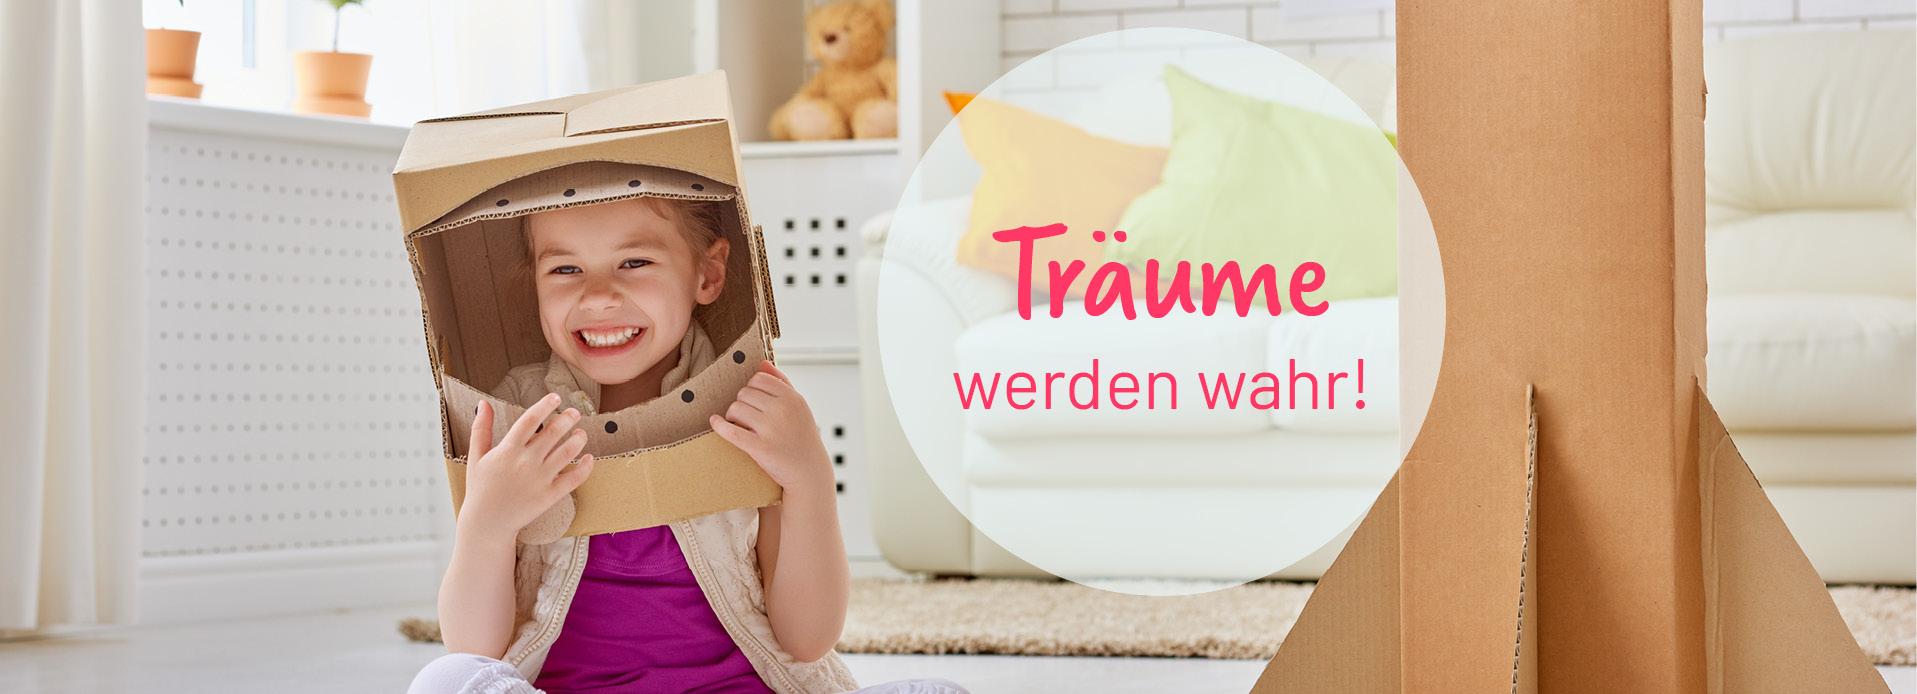 Provisio Personal GmbH - Stellenangebote